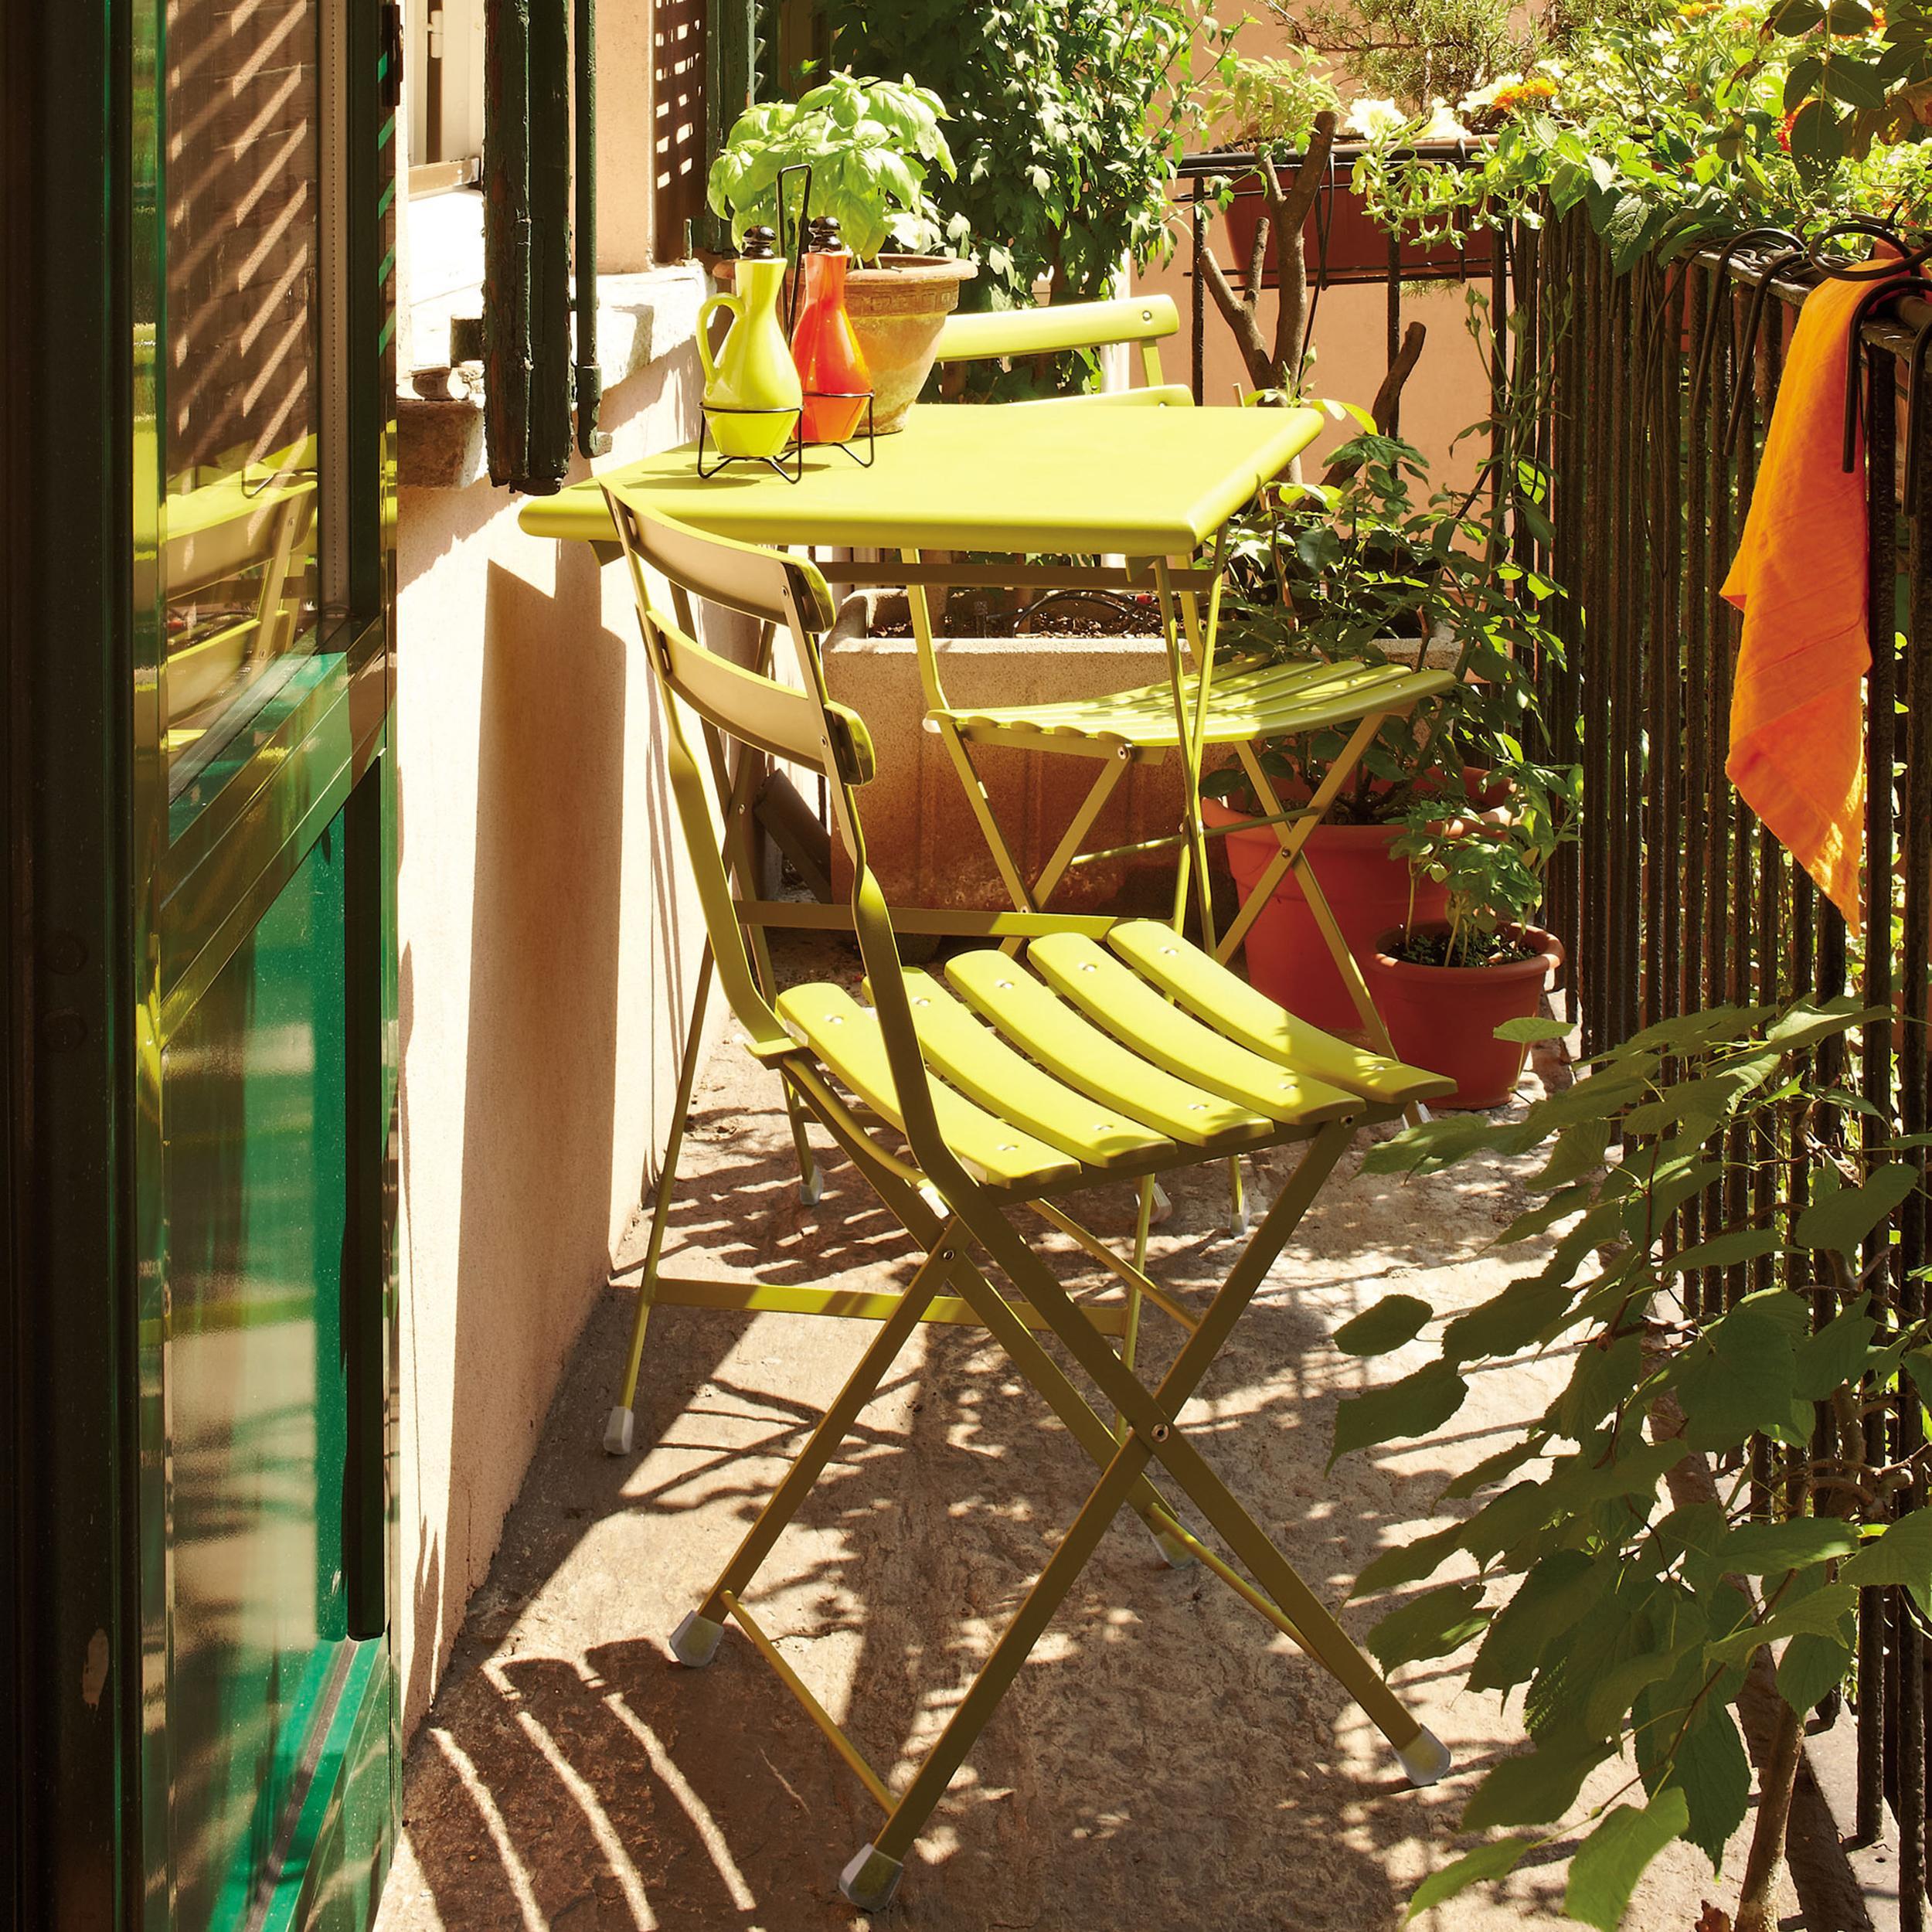 balkonmöbel • bilder & ideen • couchstyle, Hause deko